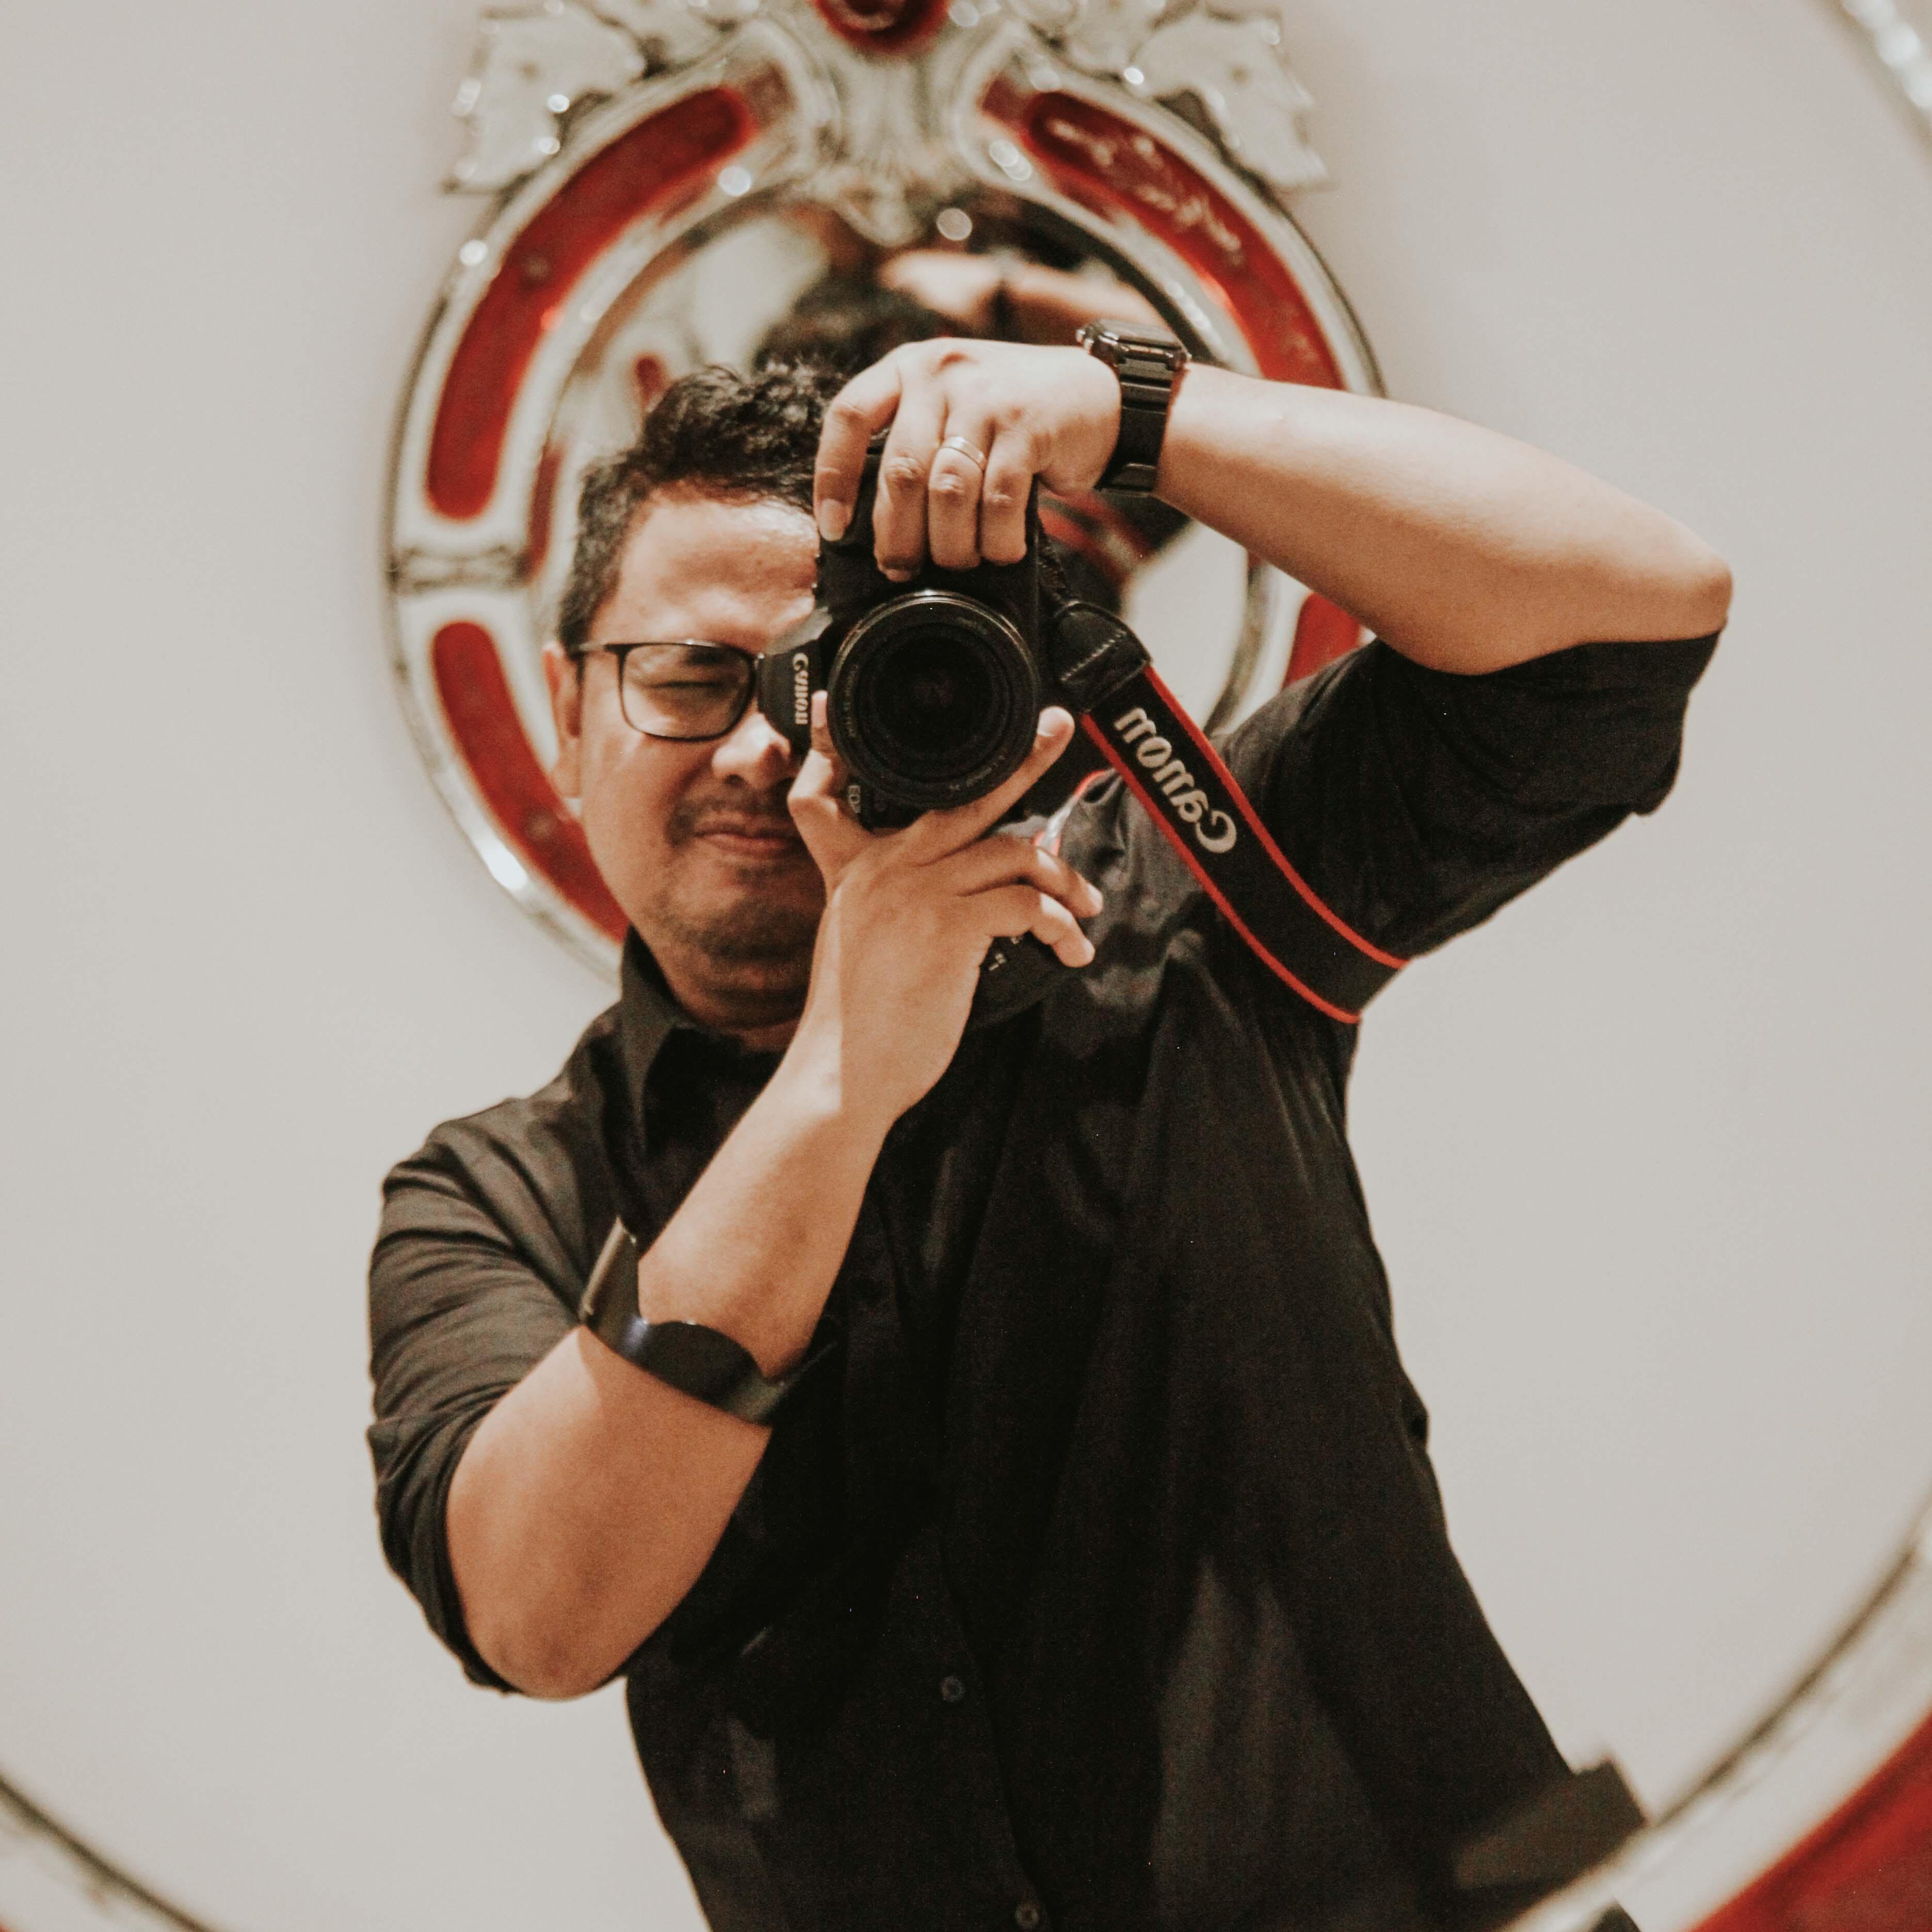 Go to Ruben Hutabarat's profile